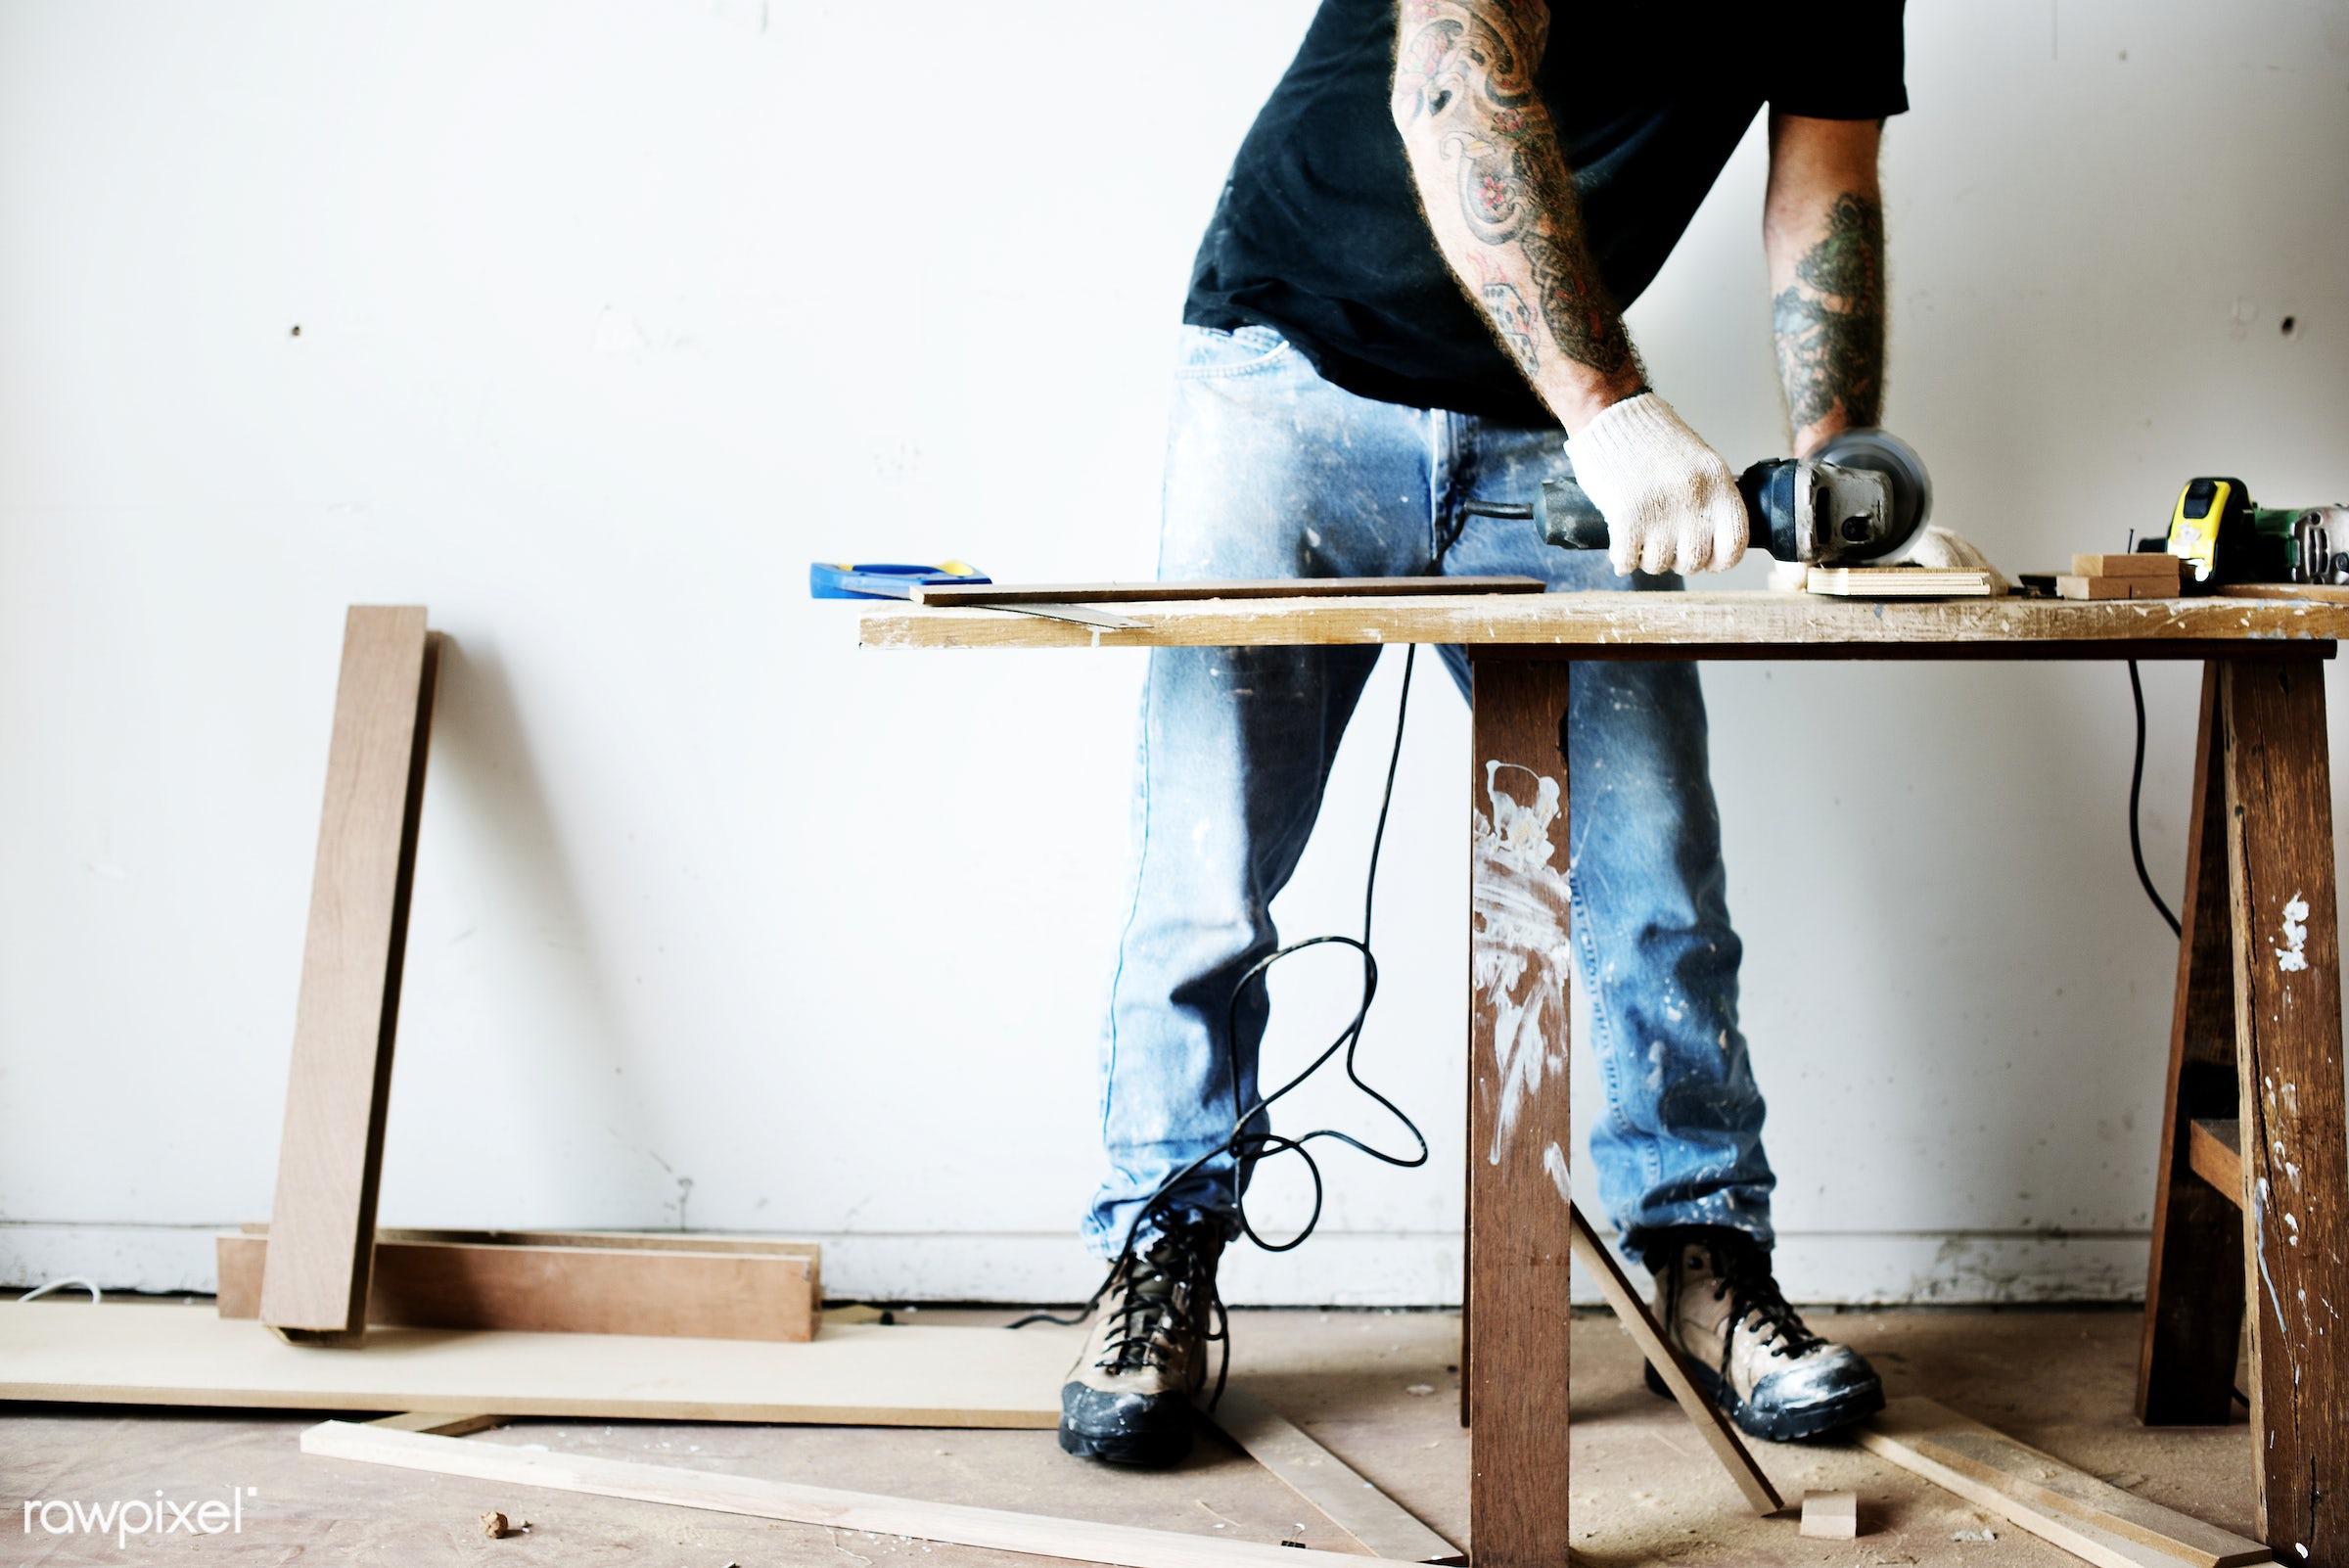 handyman, carpentry, industry, wood, activity, carpenter, construction, craft, craftsman, design, diy, equipment, handmade,...